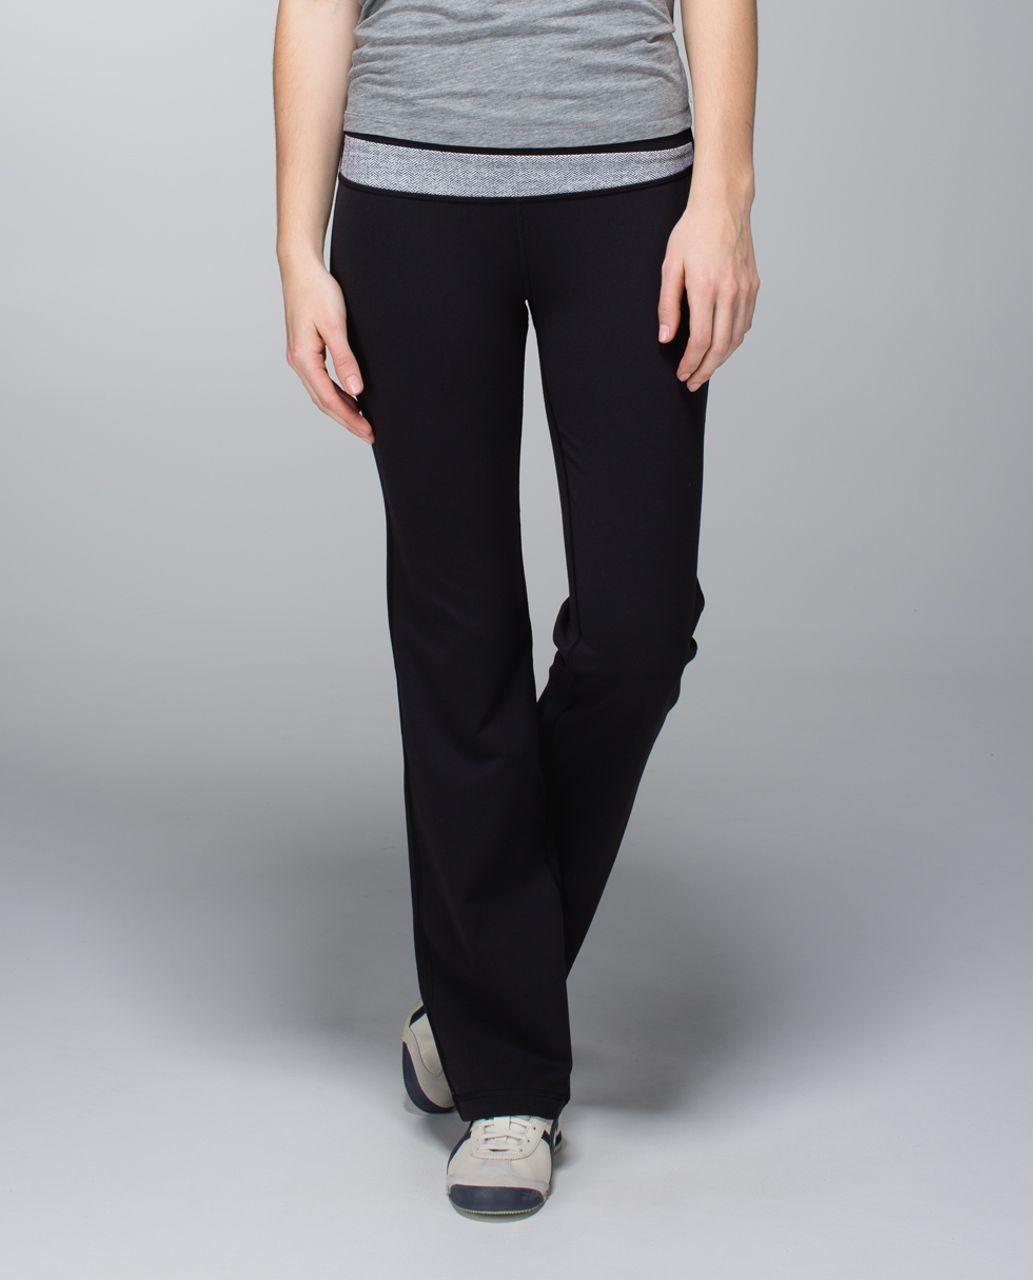 Lululemon Astro Pant (Regular) *Full-On Luon - Black / White / Heathered Herringbone Heathered Black White